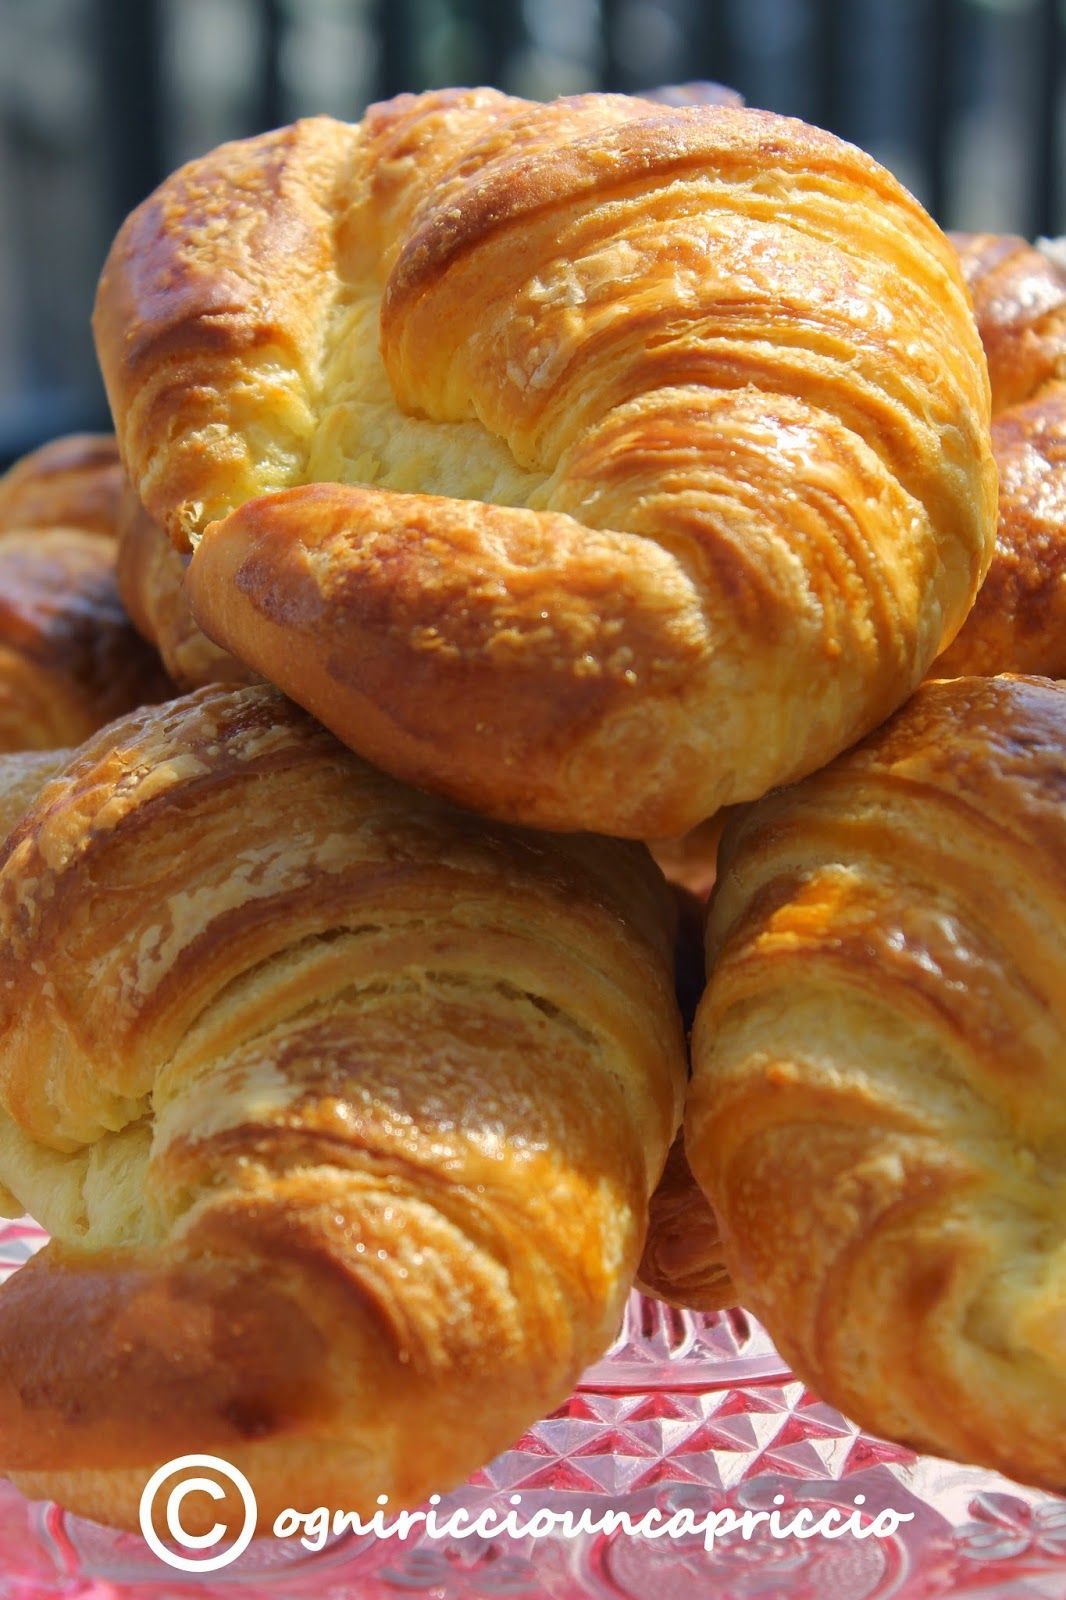 1e054b0cb57f832f94bd5ff7ea0c3cff - Croissant Ricette